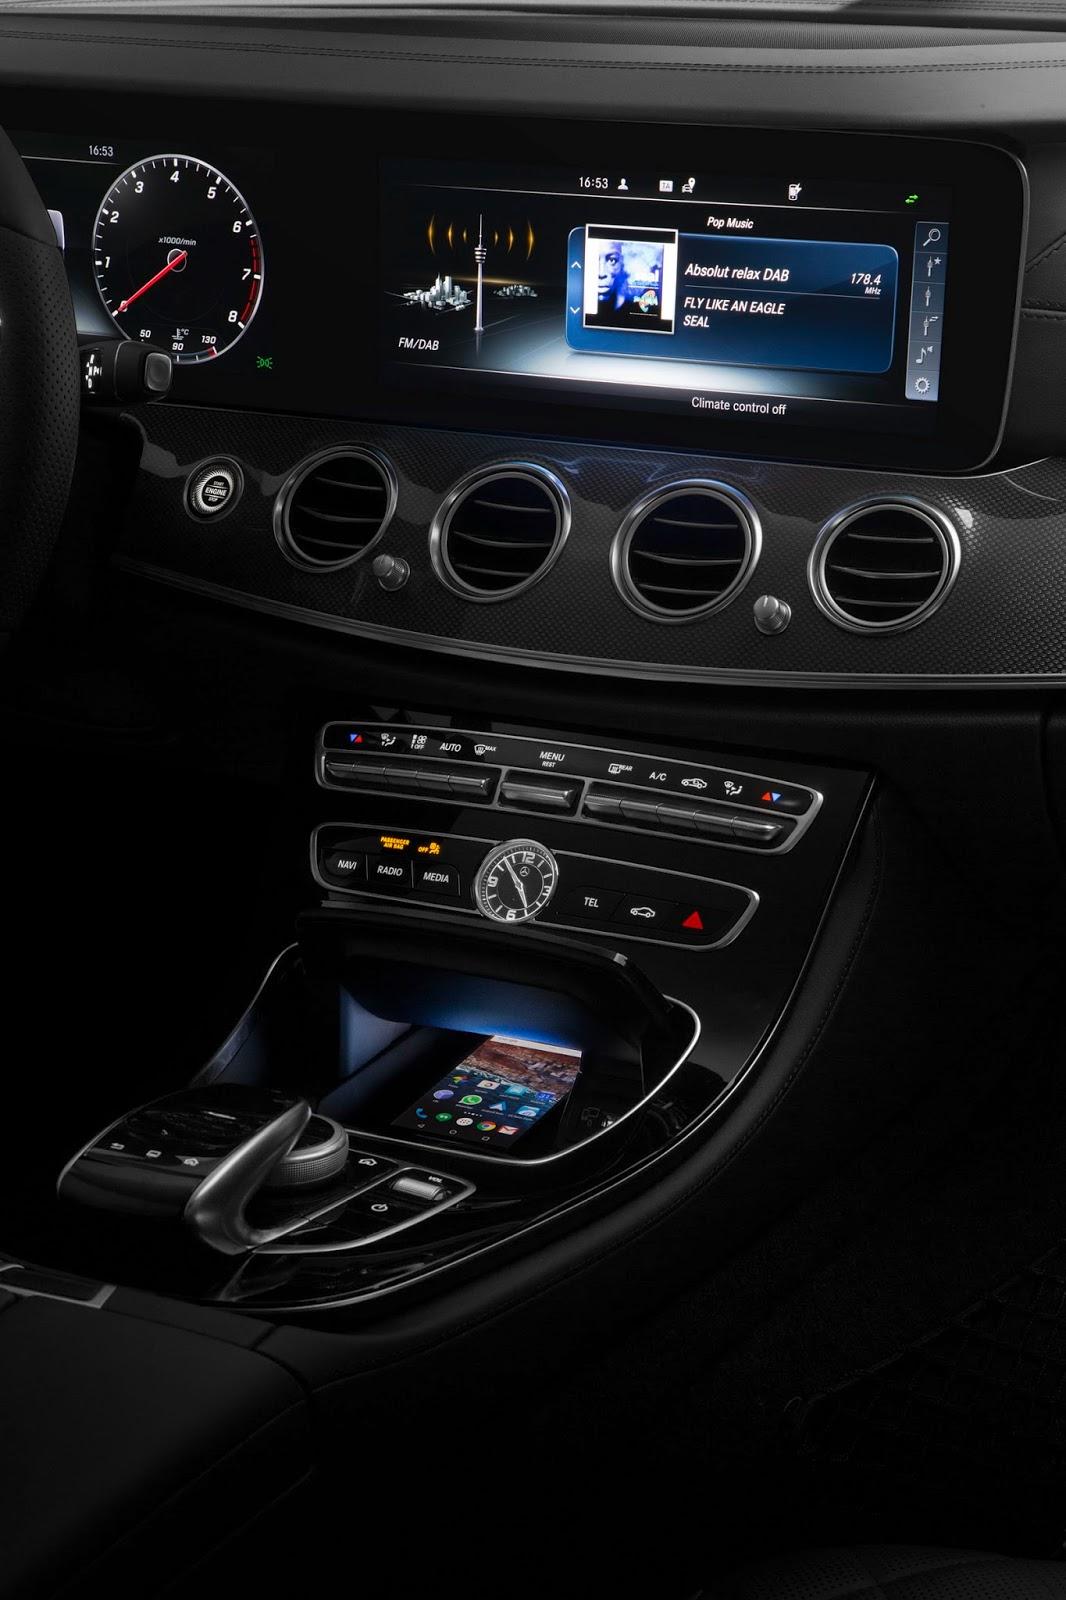 2017 Mercedes Benz E Class Dashboard Shown At Ces